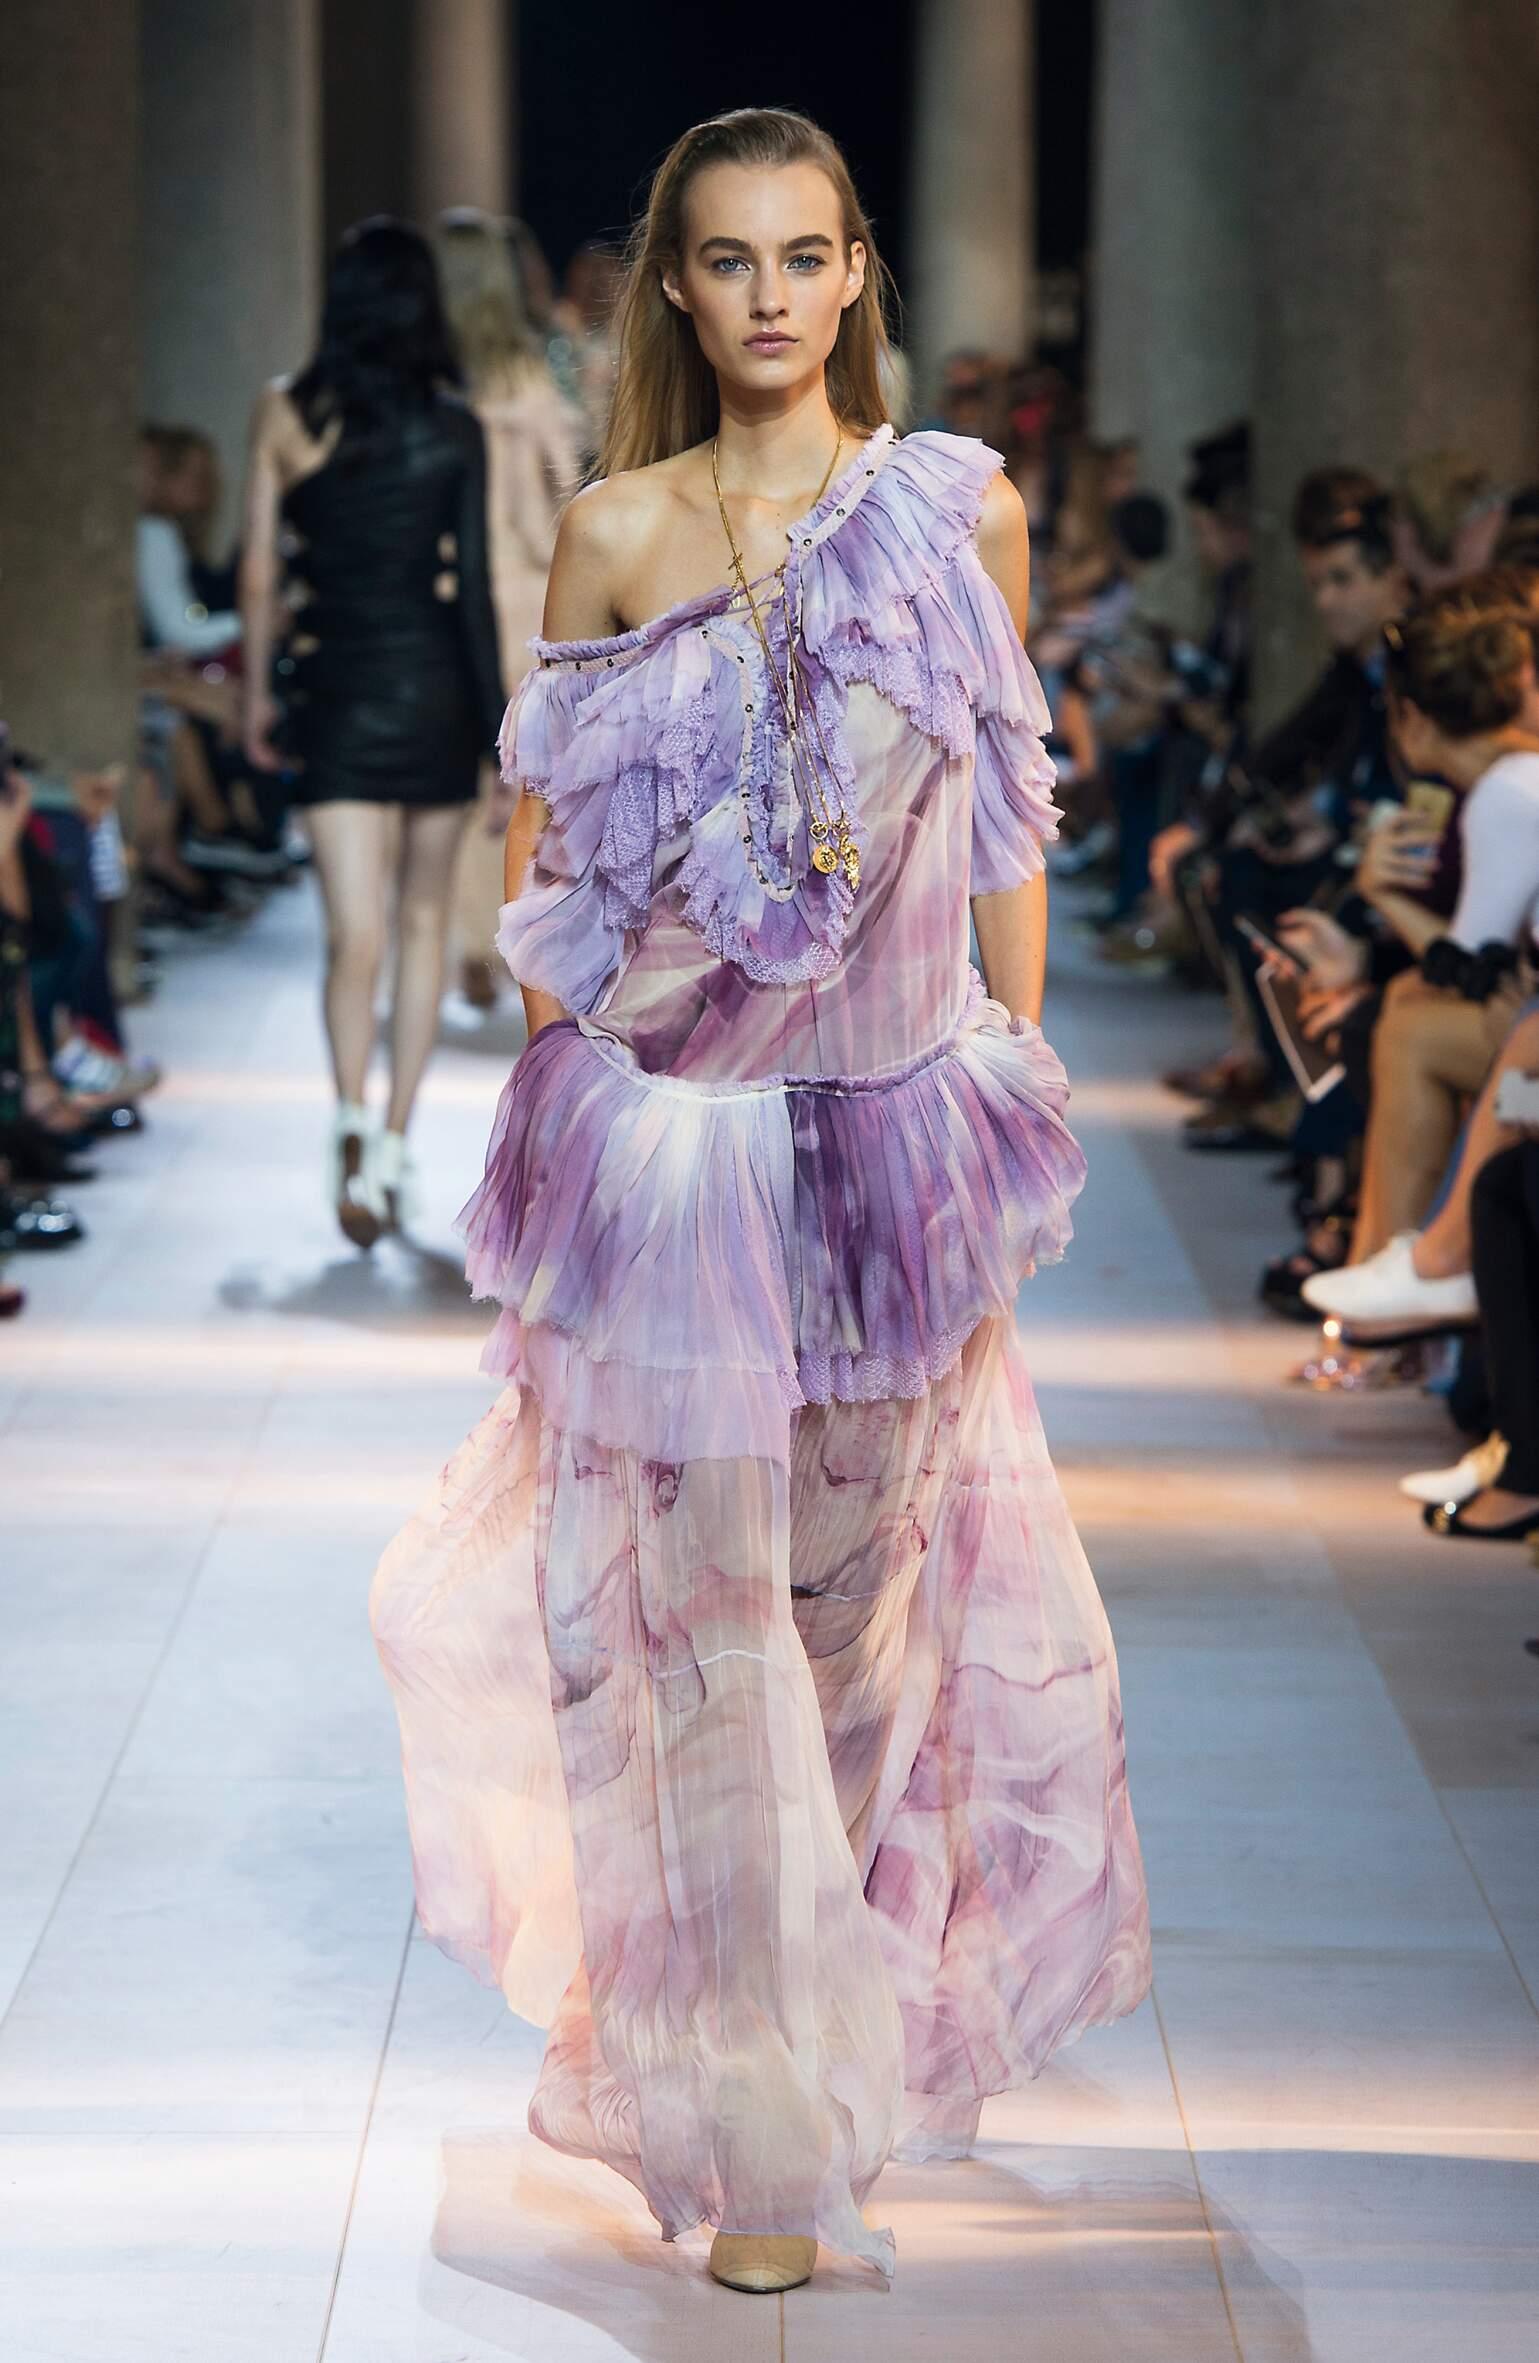 Fashion 2016 Catwalk Roberto Cavalli Summer